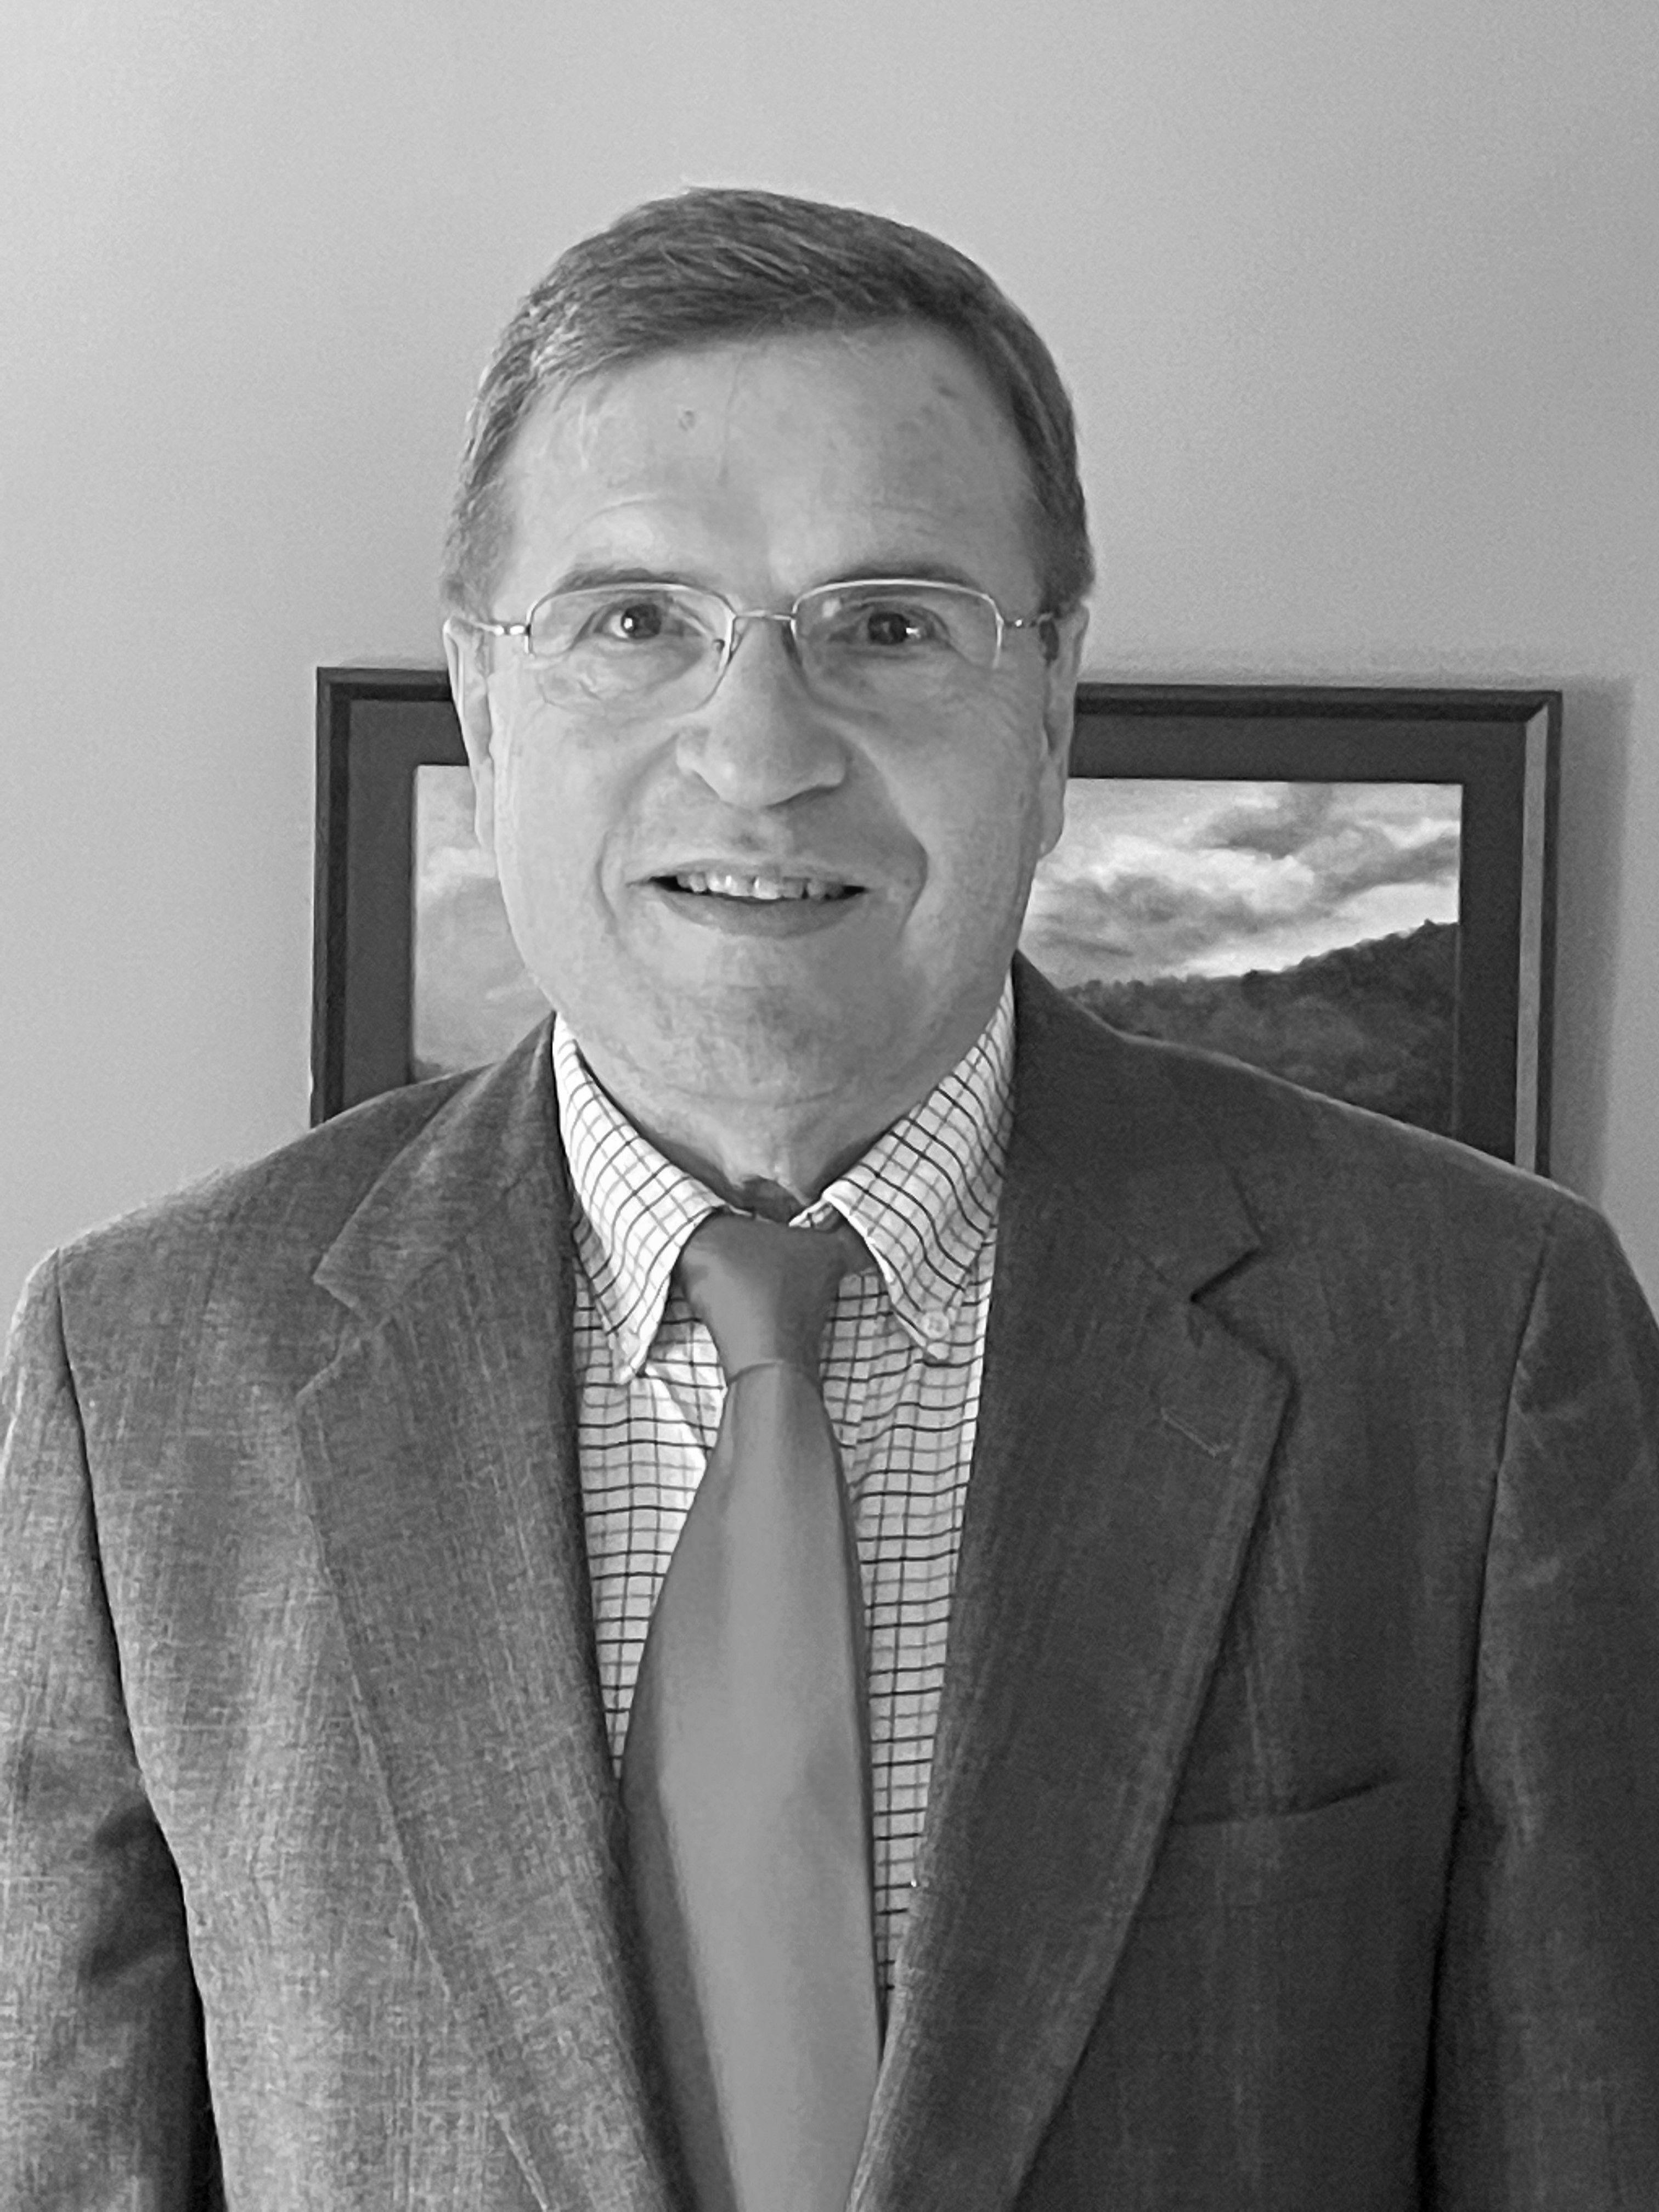 Kenneth Carlstedt